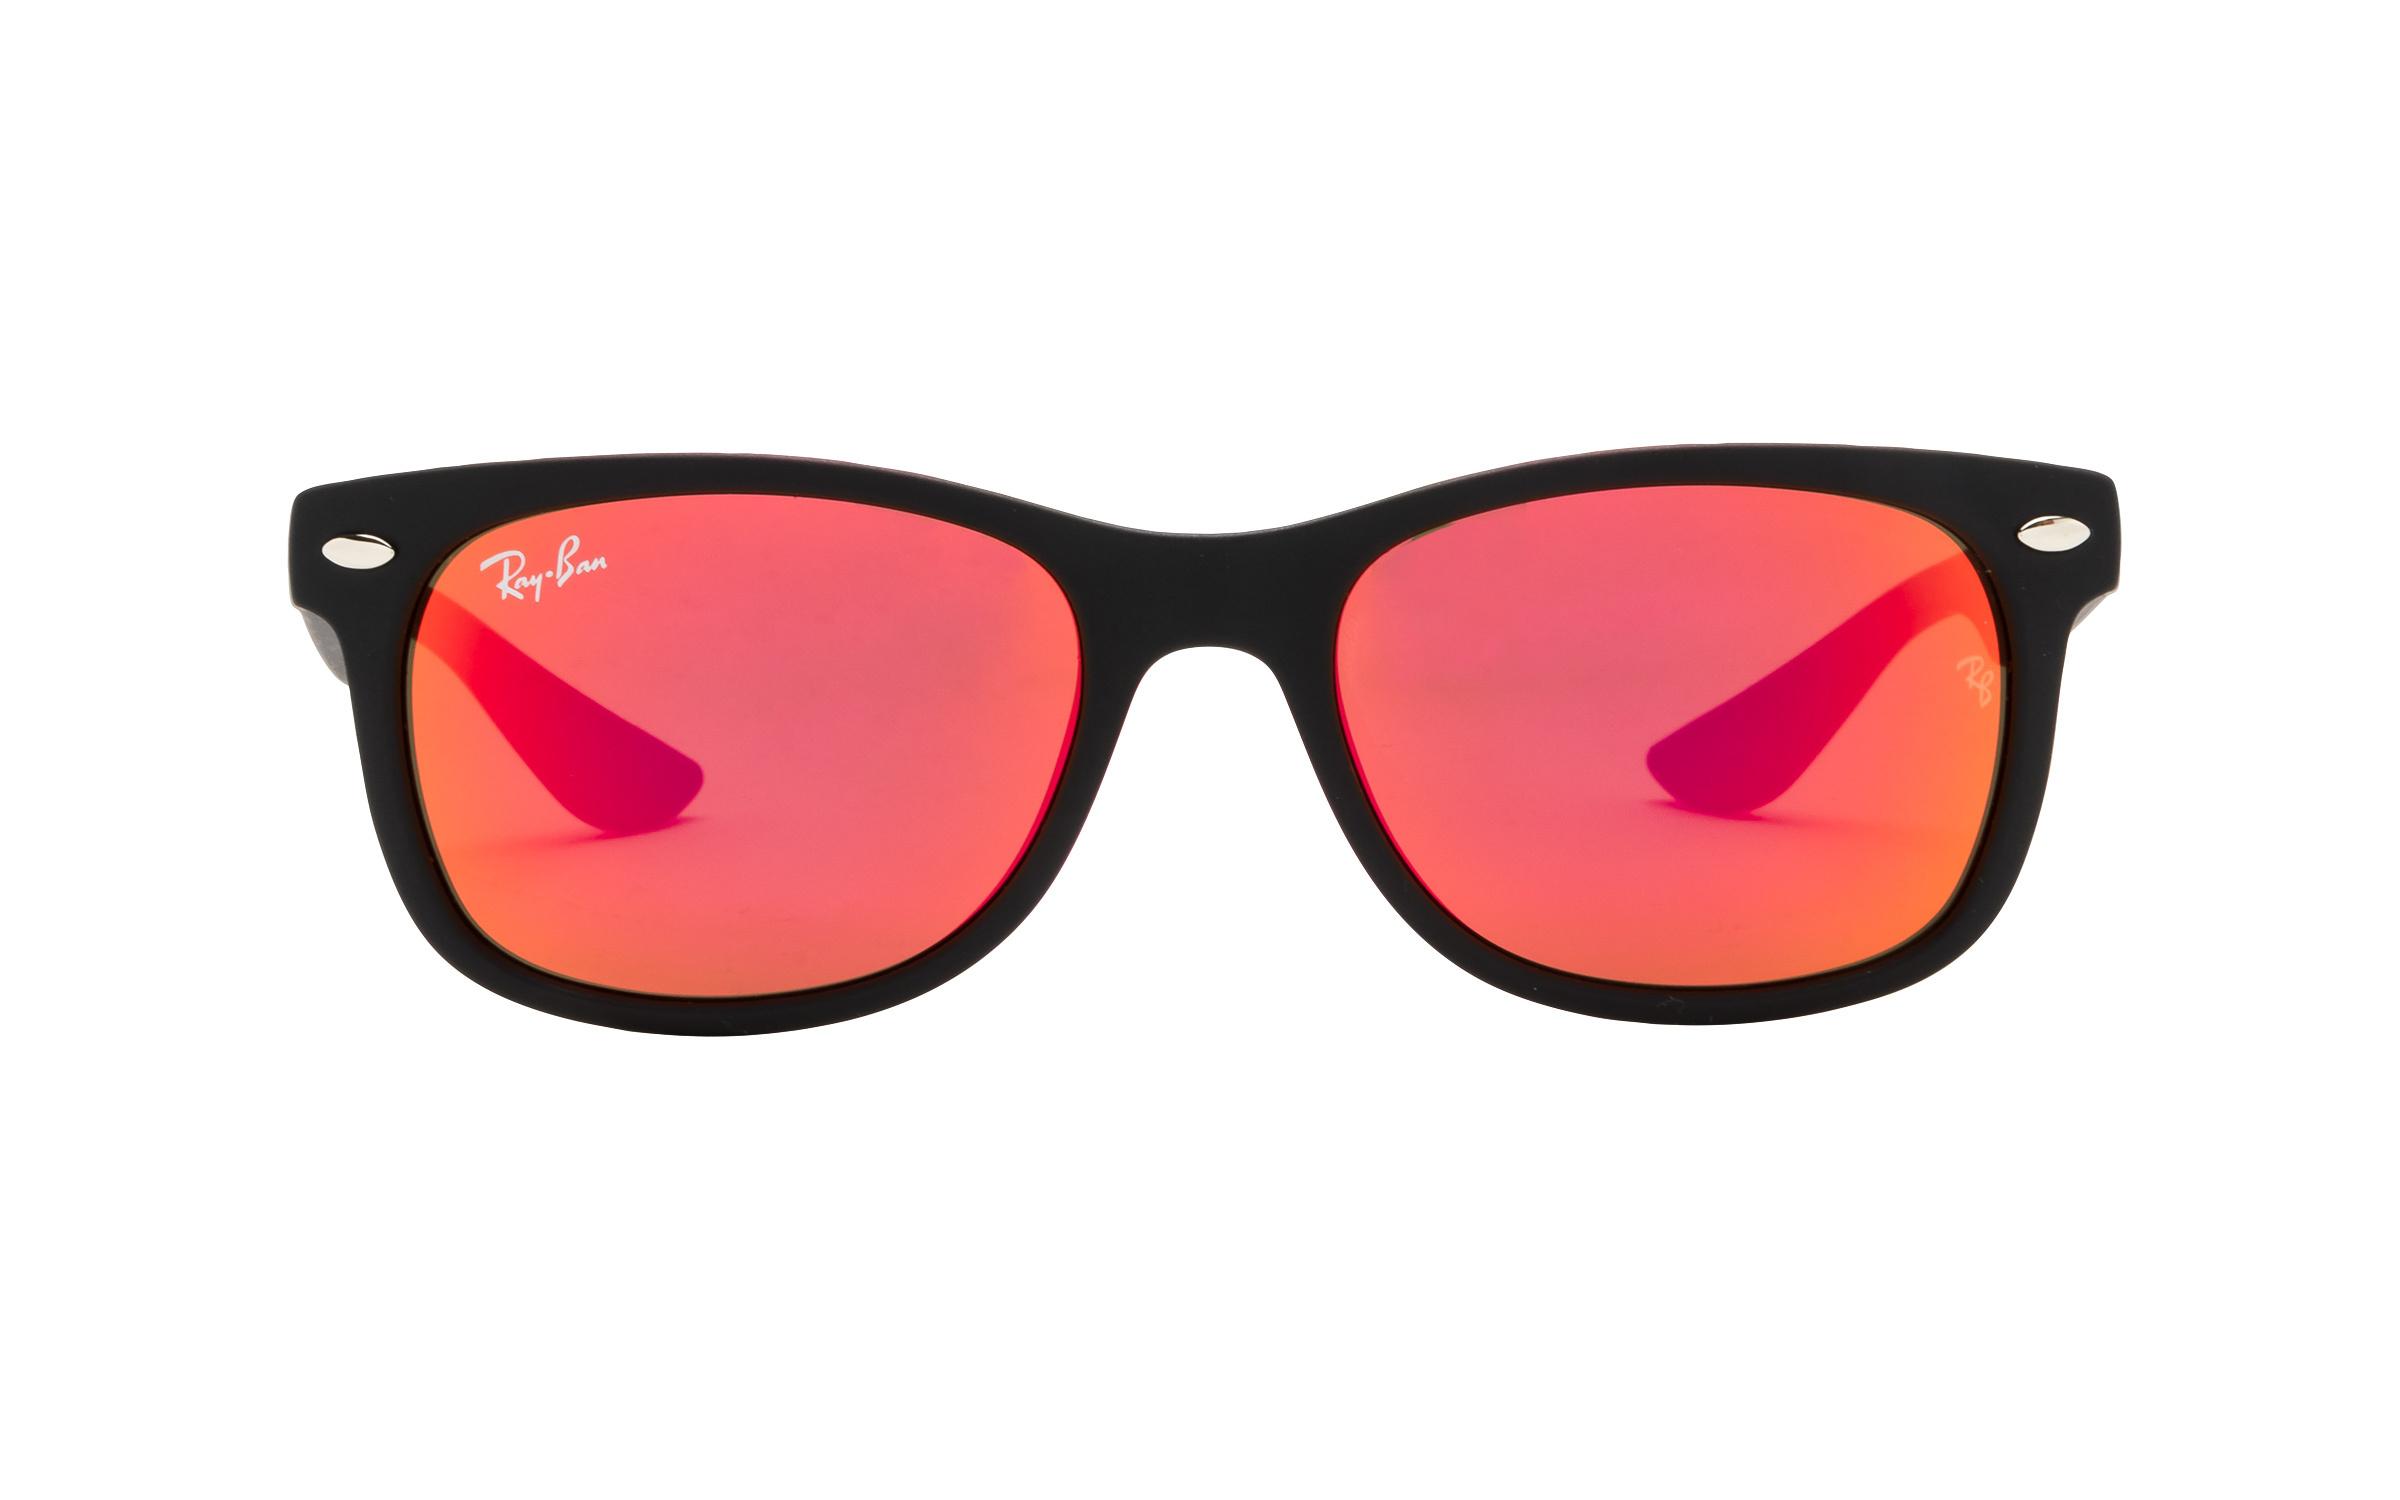 Luxottica Ray-Ban Wayfarer Junior RJ9052S 100S6Q 47 Sunglasses in Matte Black | Plastic/Metal - Online Coastal